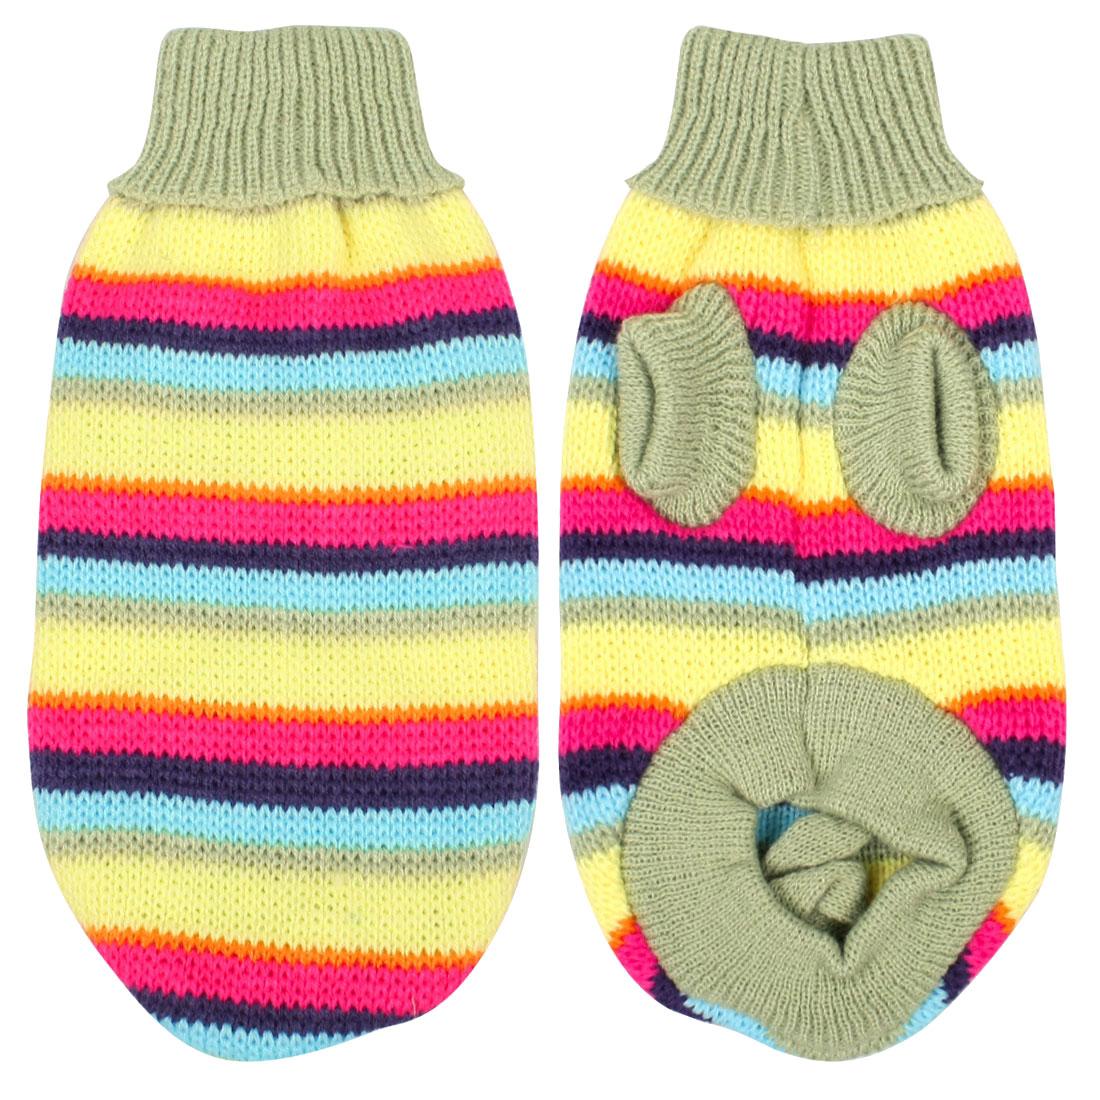 Pet Dog Puppy Sweater Knitwear Clothes Warm Turtleneck Striped Green M